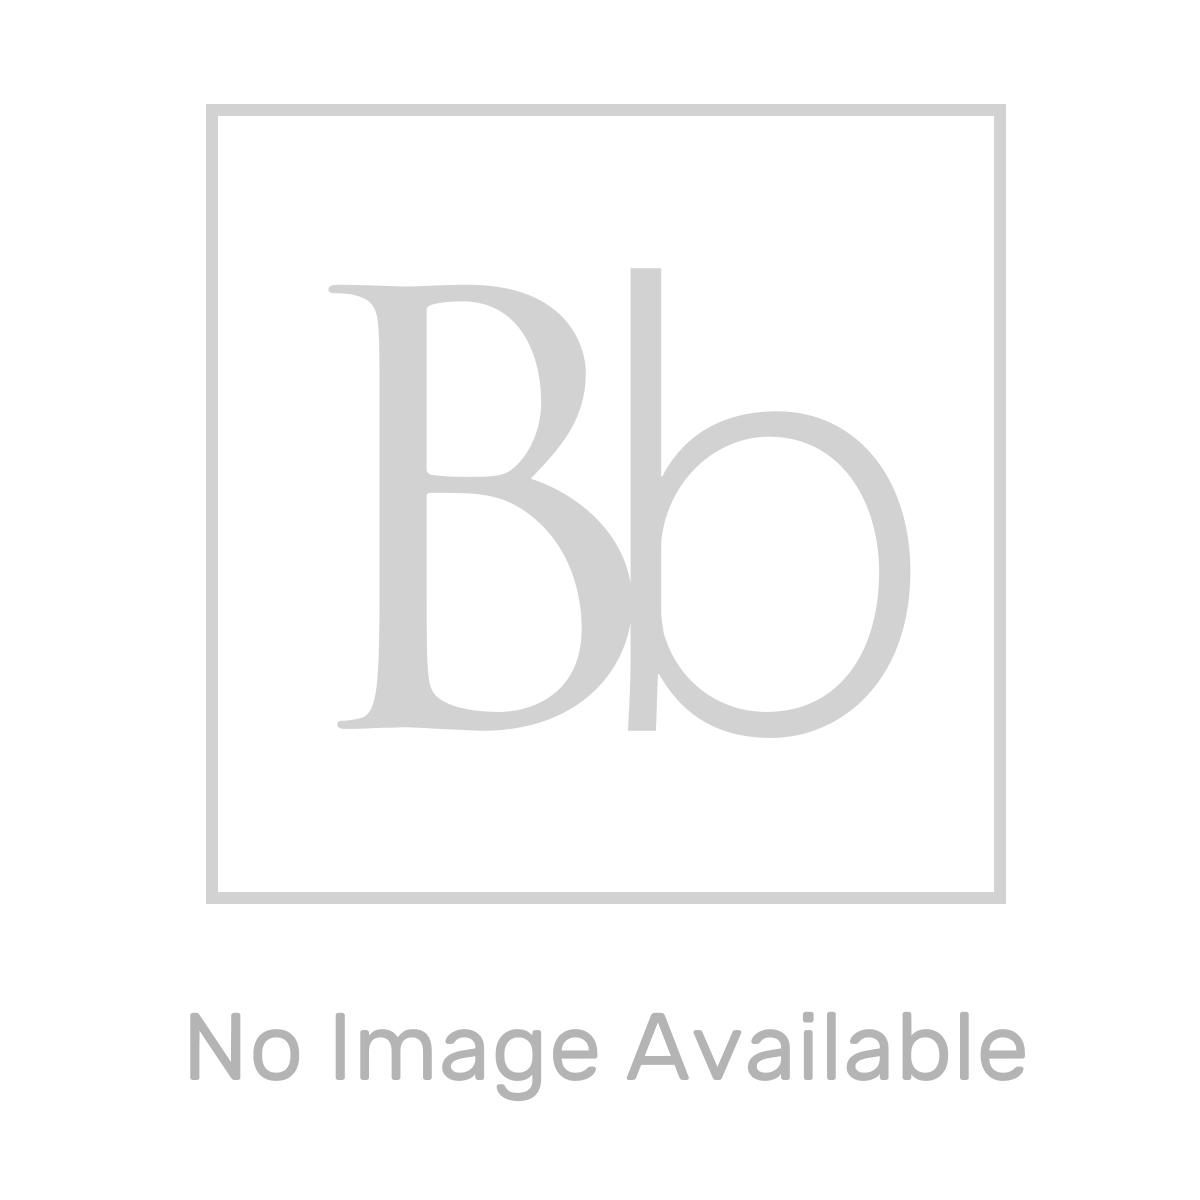 RAK Series 600 Inset Vanity Basin 500mm Lifestyle